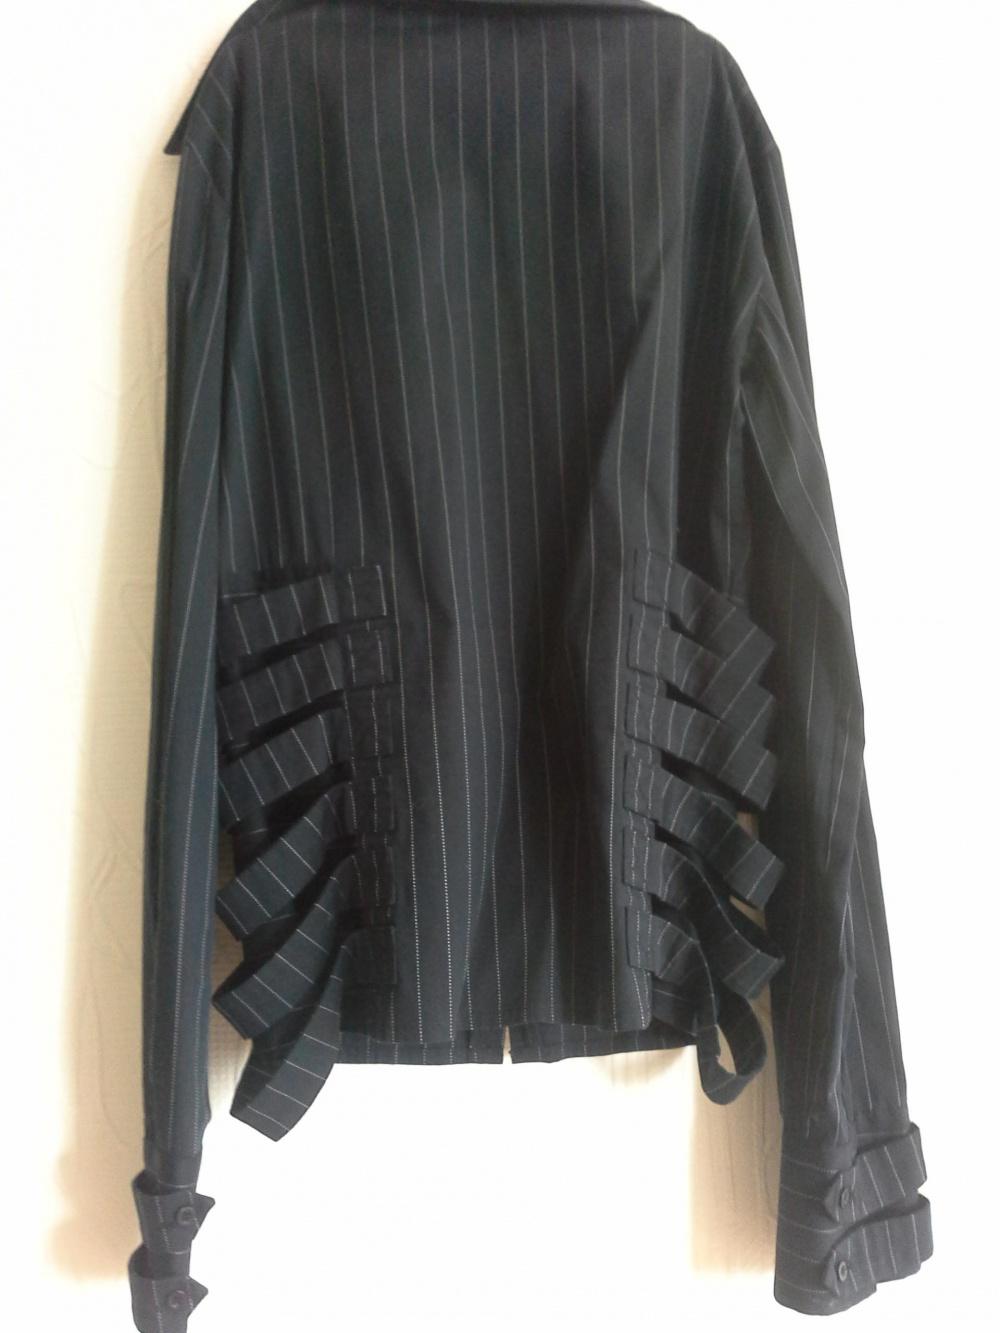 Рубашка DKNY,  XS.